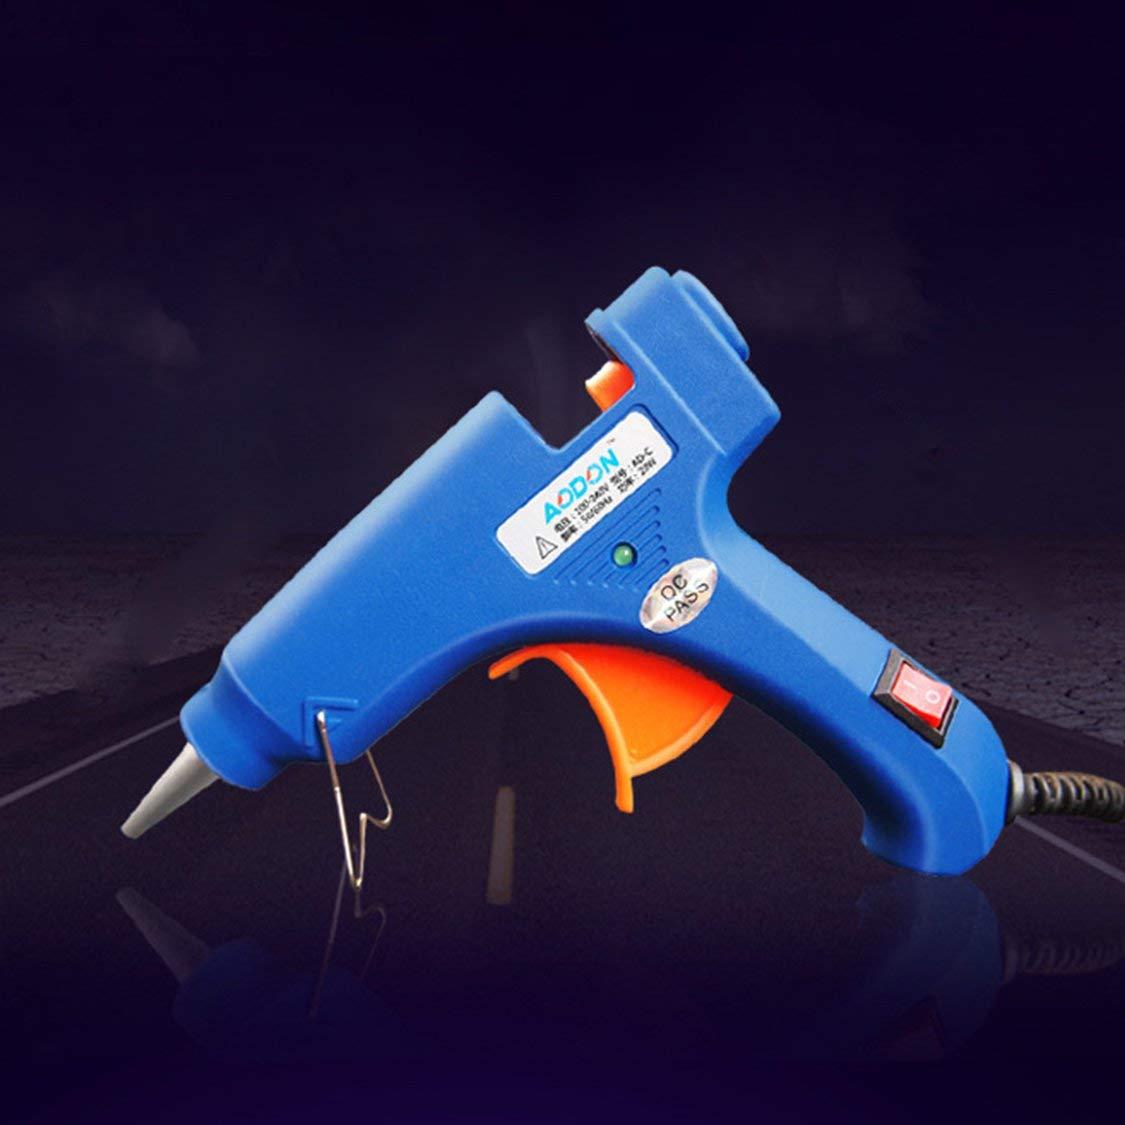 Pistola de pegamento con interruptor 20W Pistola de pegamento caliente Pistola de pegamento de fusi/ón en caliente Mini pistola de pegamento Diy Jewelry